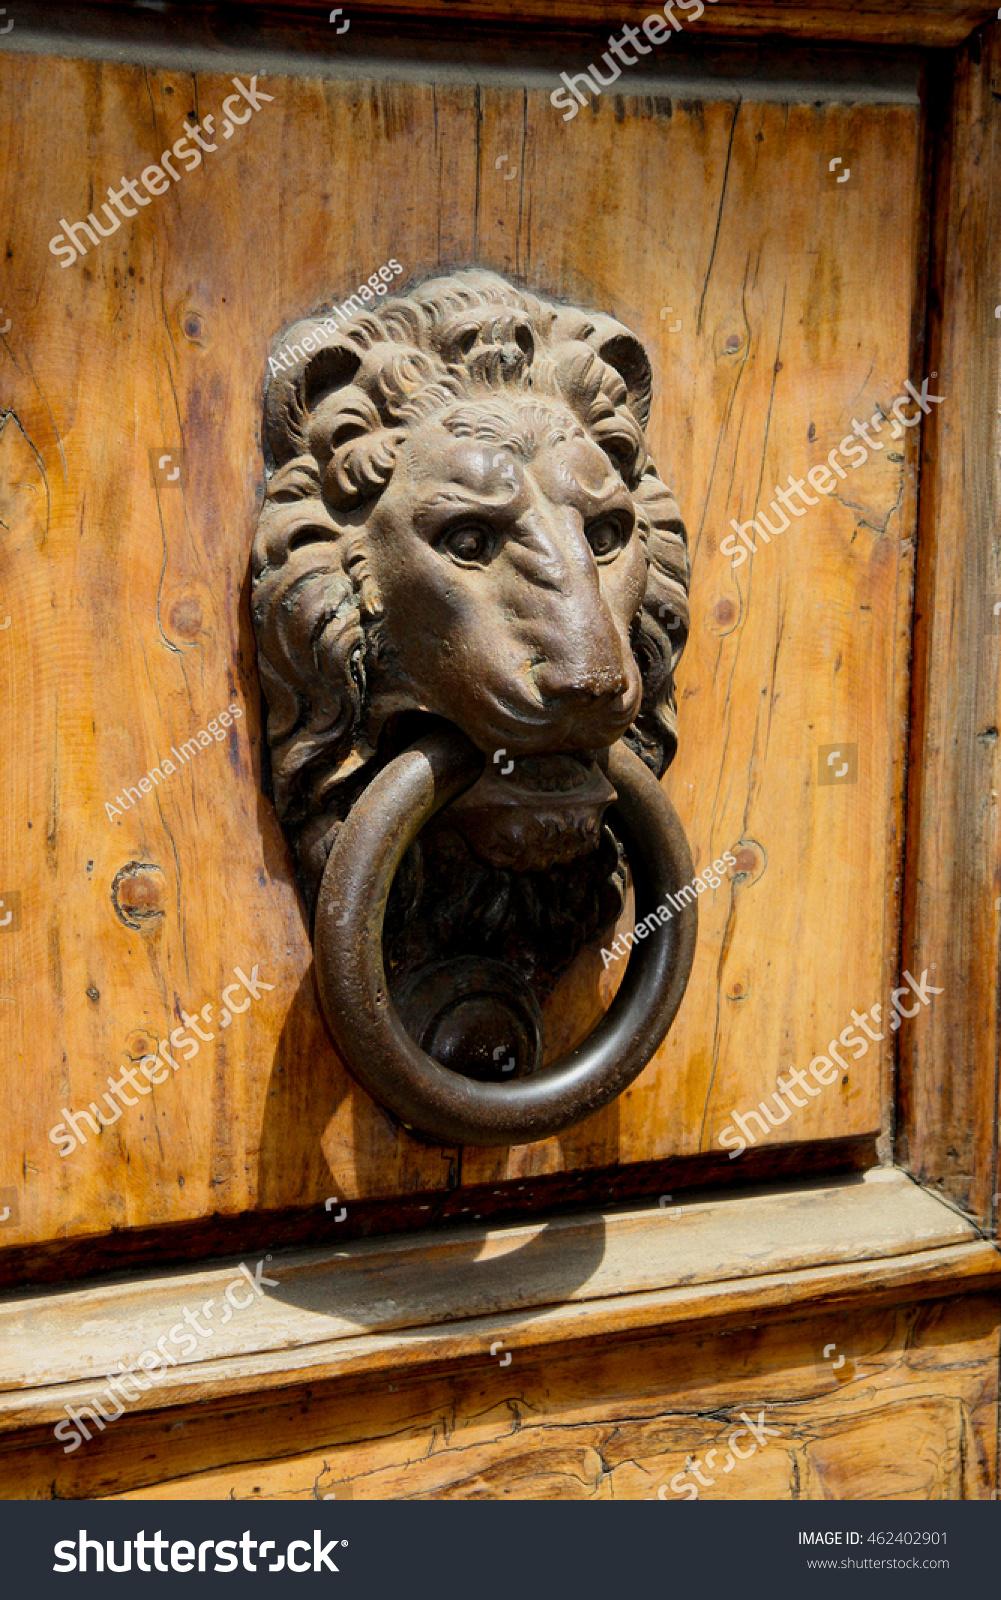 Antique lion head door knocker on an old, heavy wooden door - Antique Lion Head Door Knocker On Stock Photo 462402901 - Shutterstock